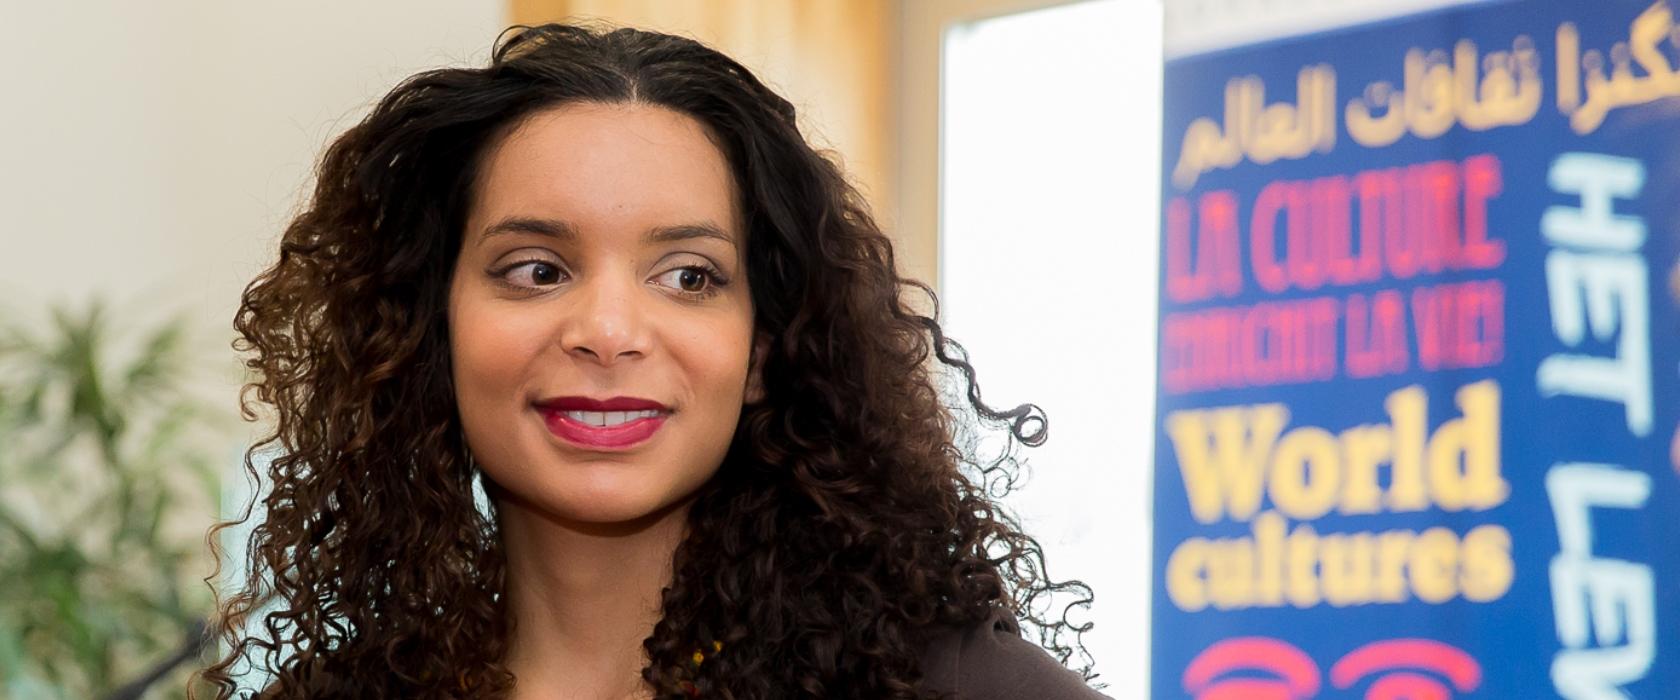 Women Unlimited www.denozem.com (257 van 369)